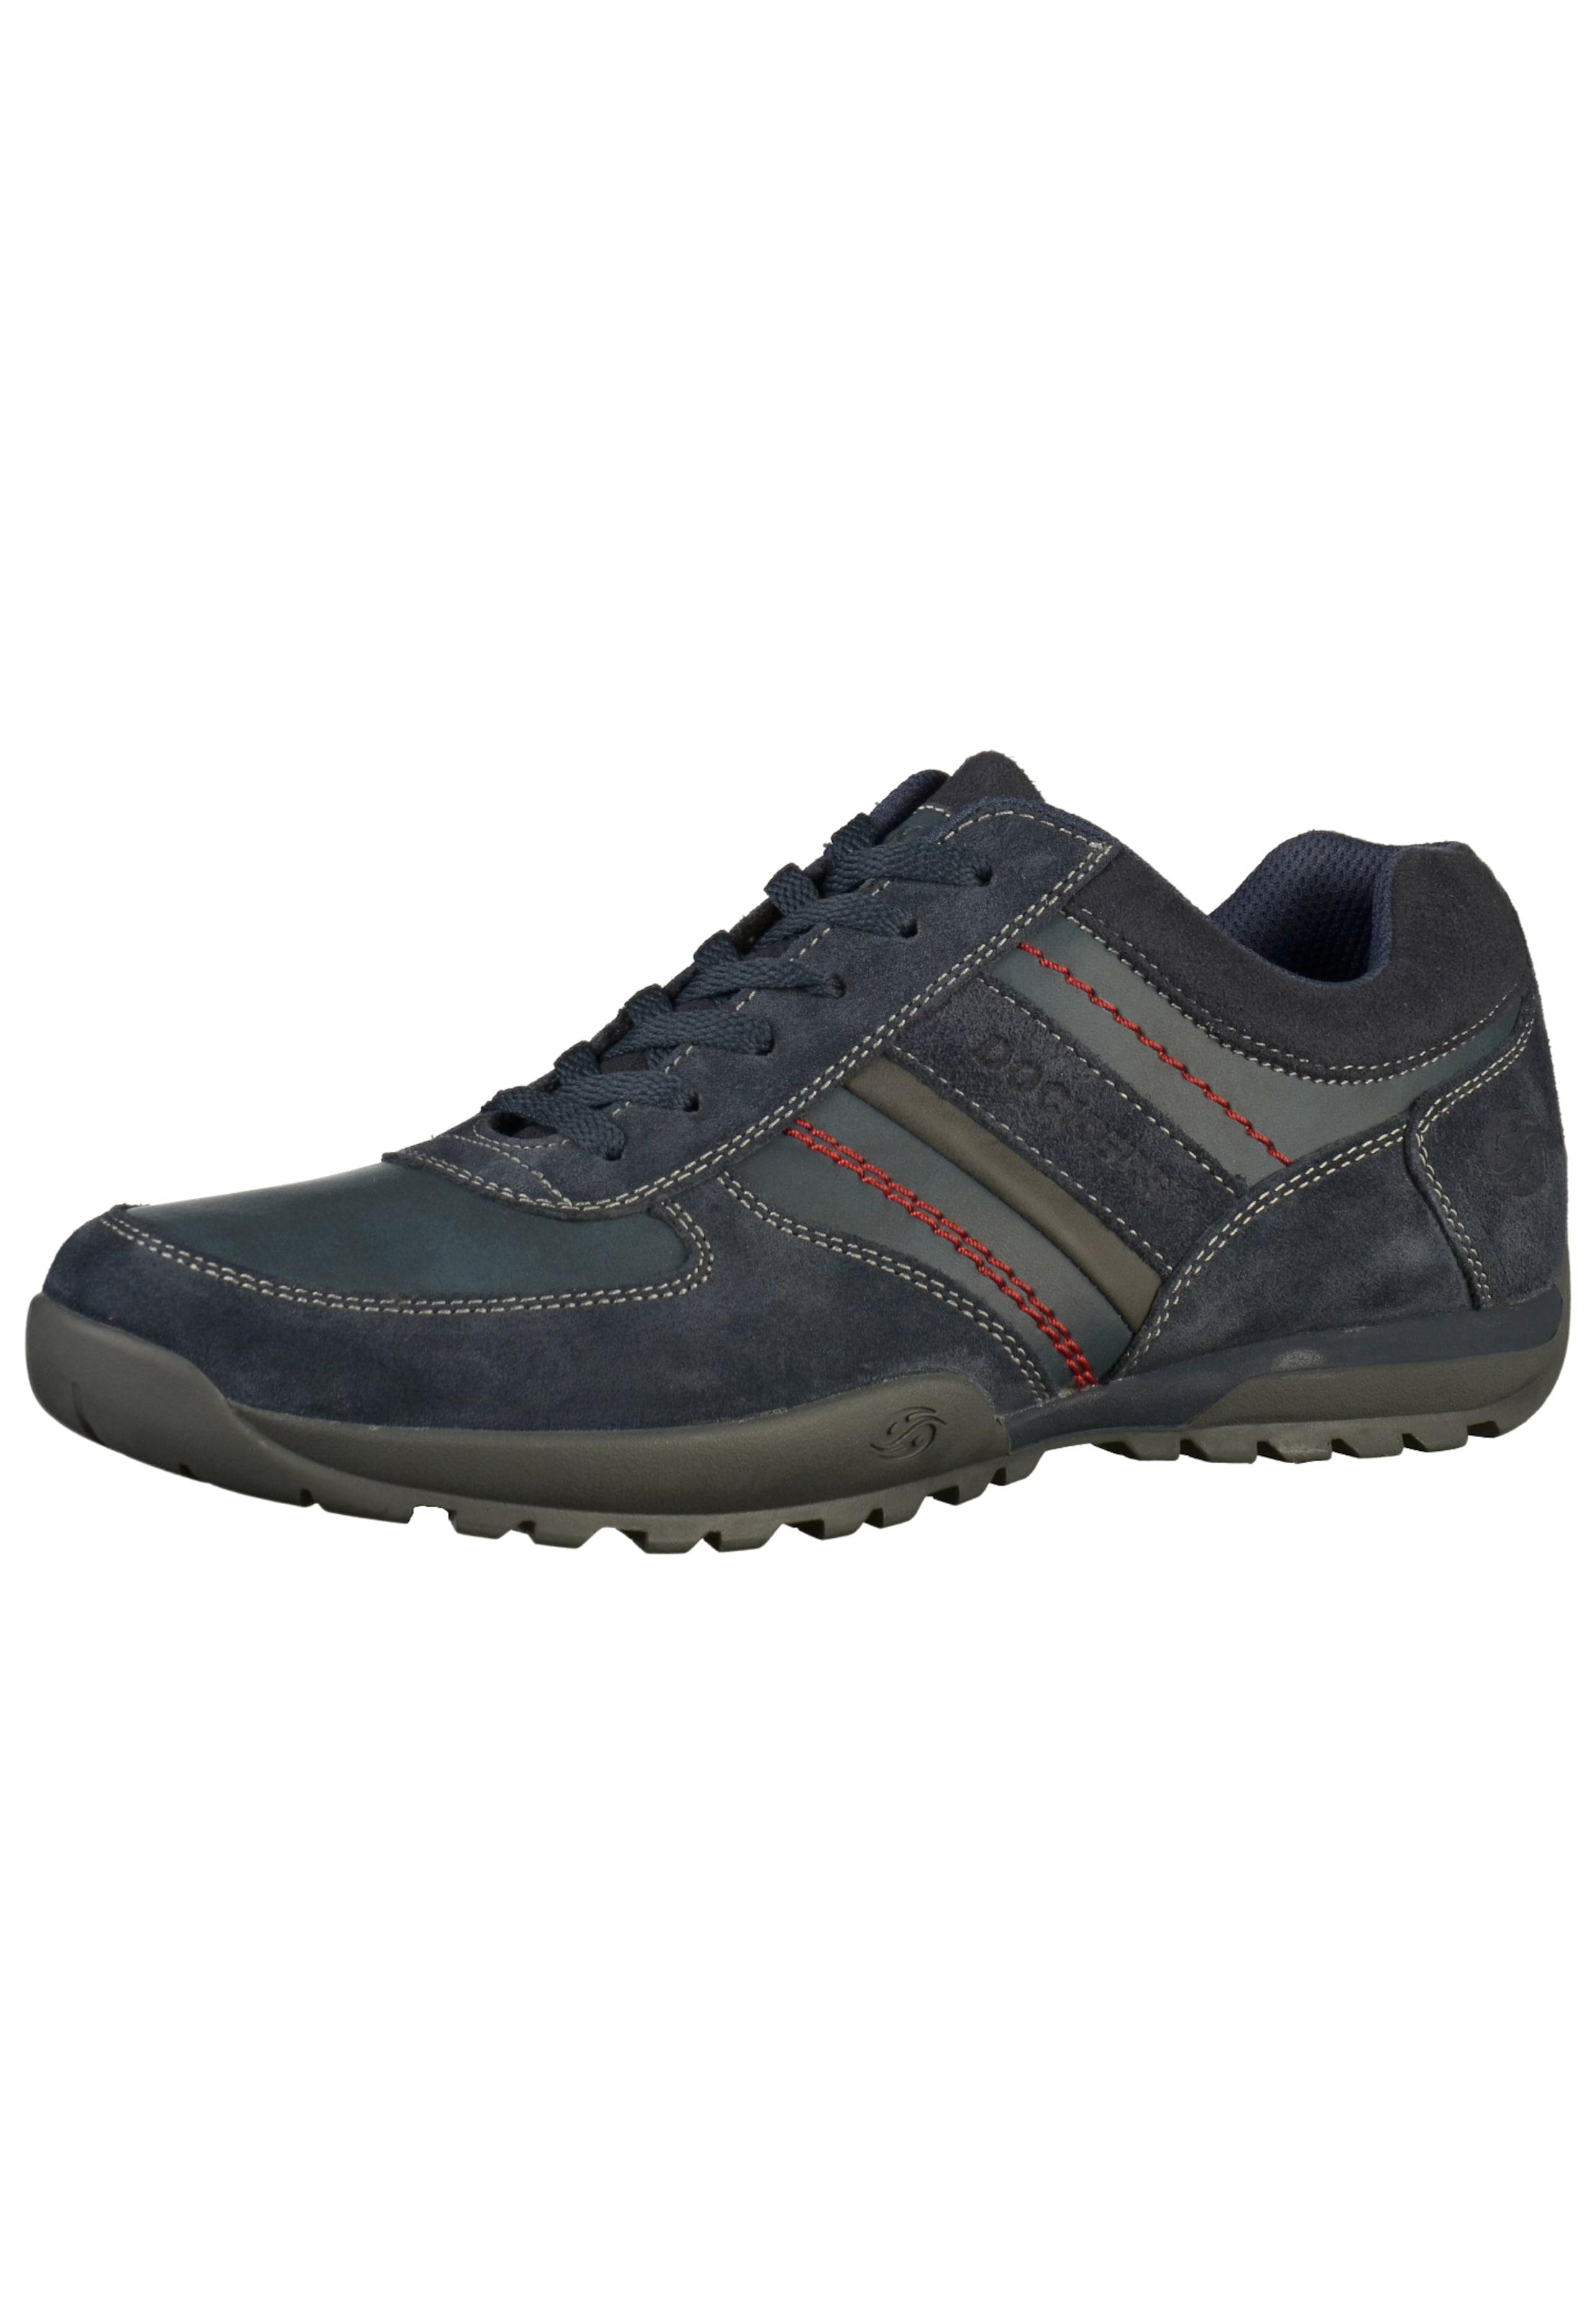 Dockers by Gerli Halbschuhe Verschleißfeste billige Schuhe